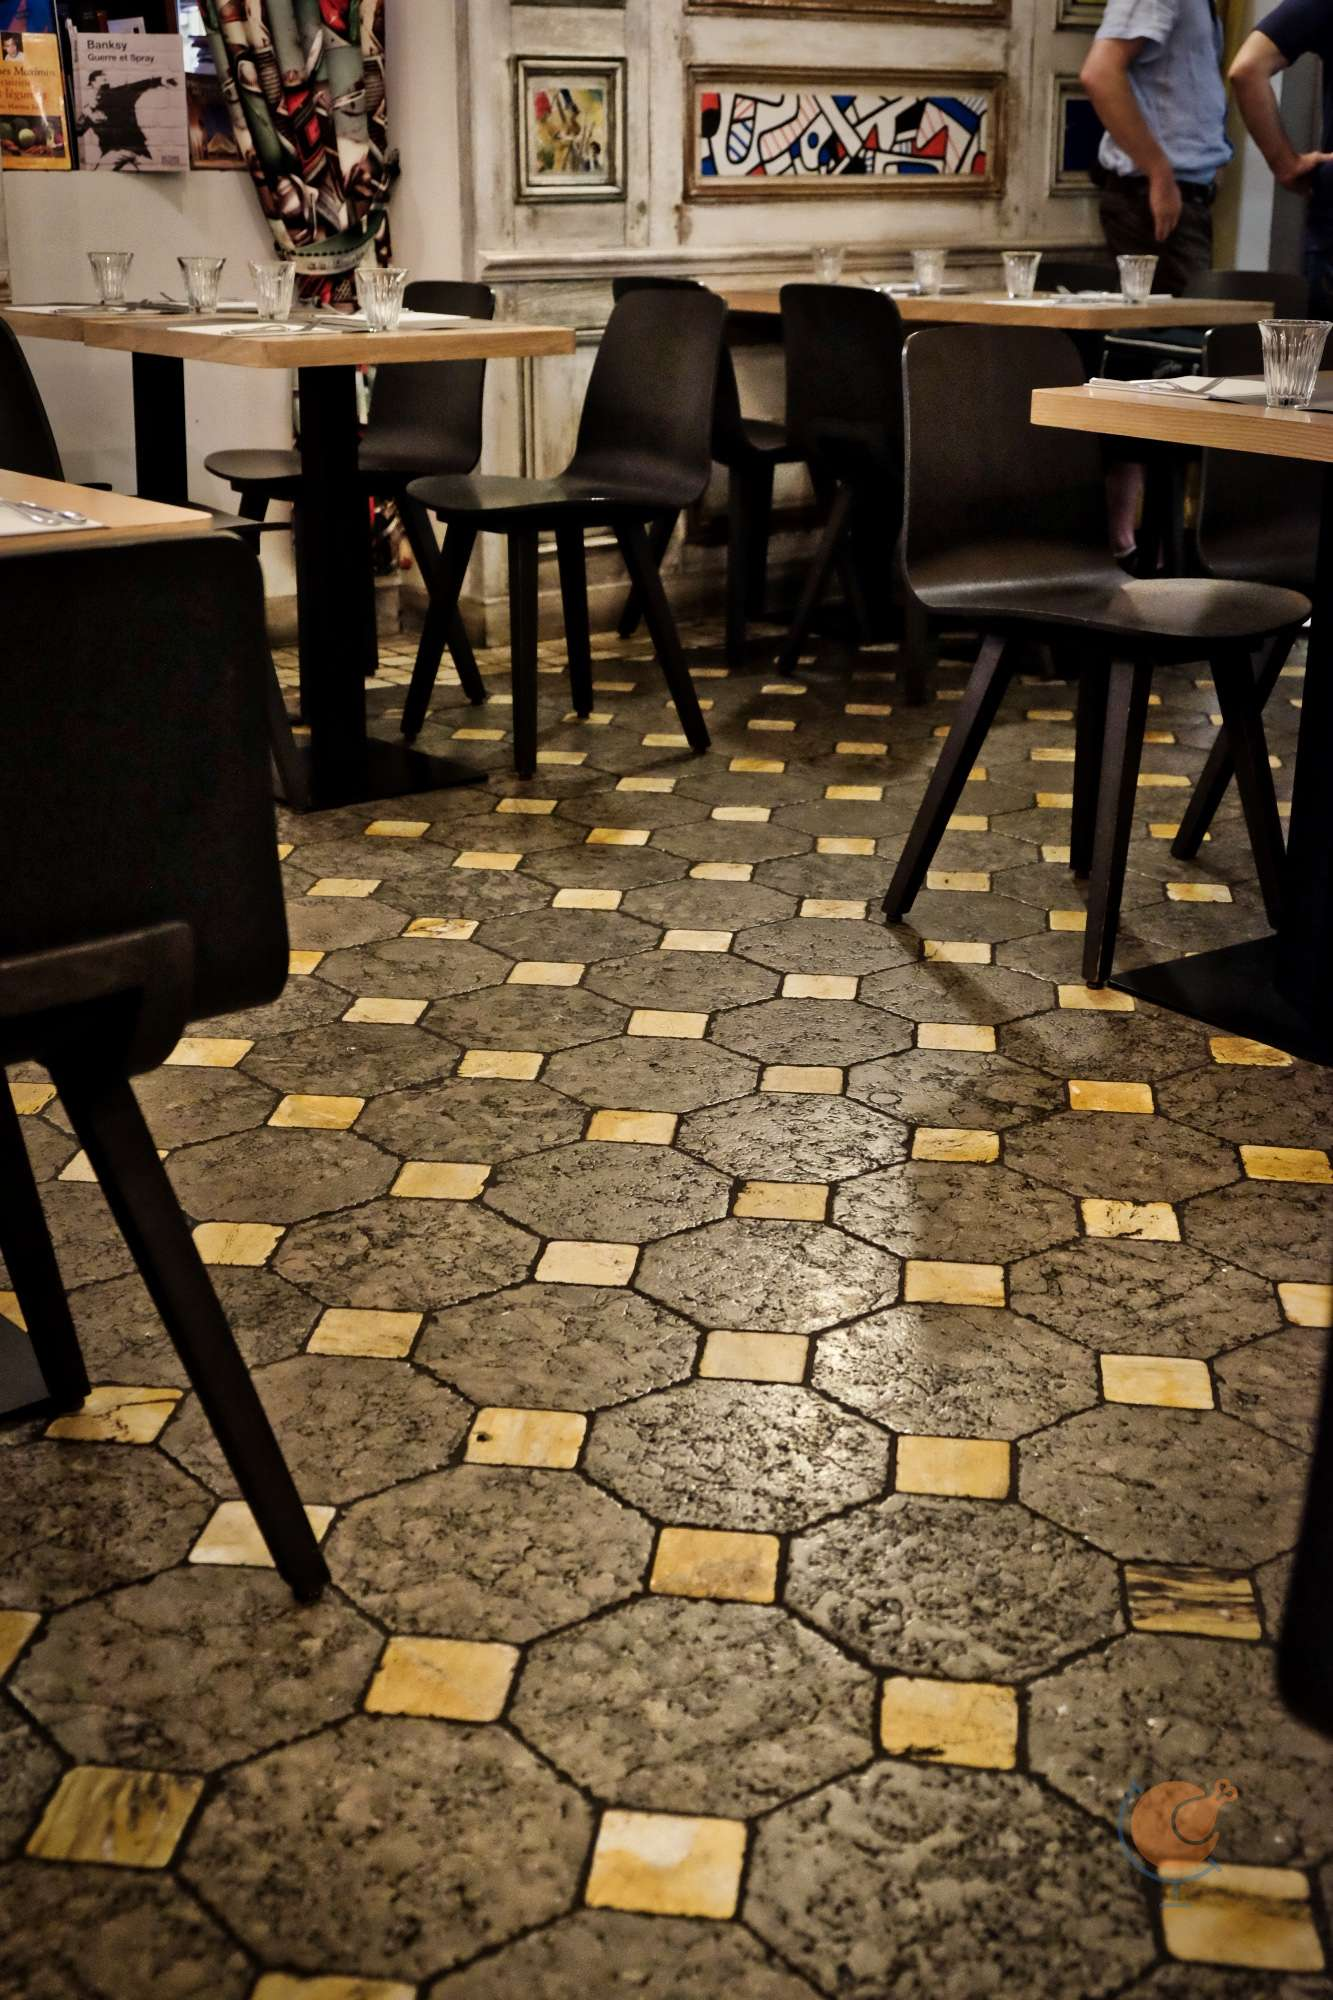 dscf1425_bar_des_oiseaux_restaurant_france_nice_nizza_vilagevo_jokuti_andras_l_w.jpg